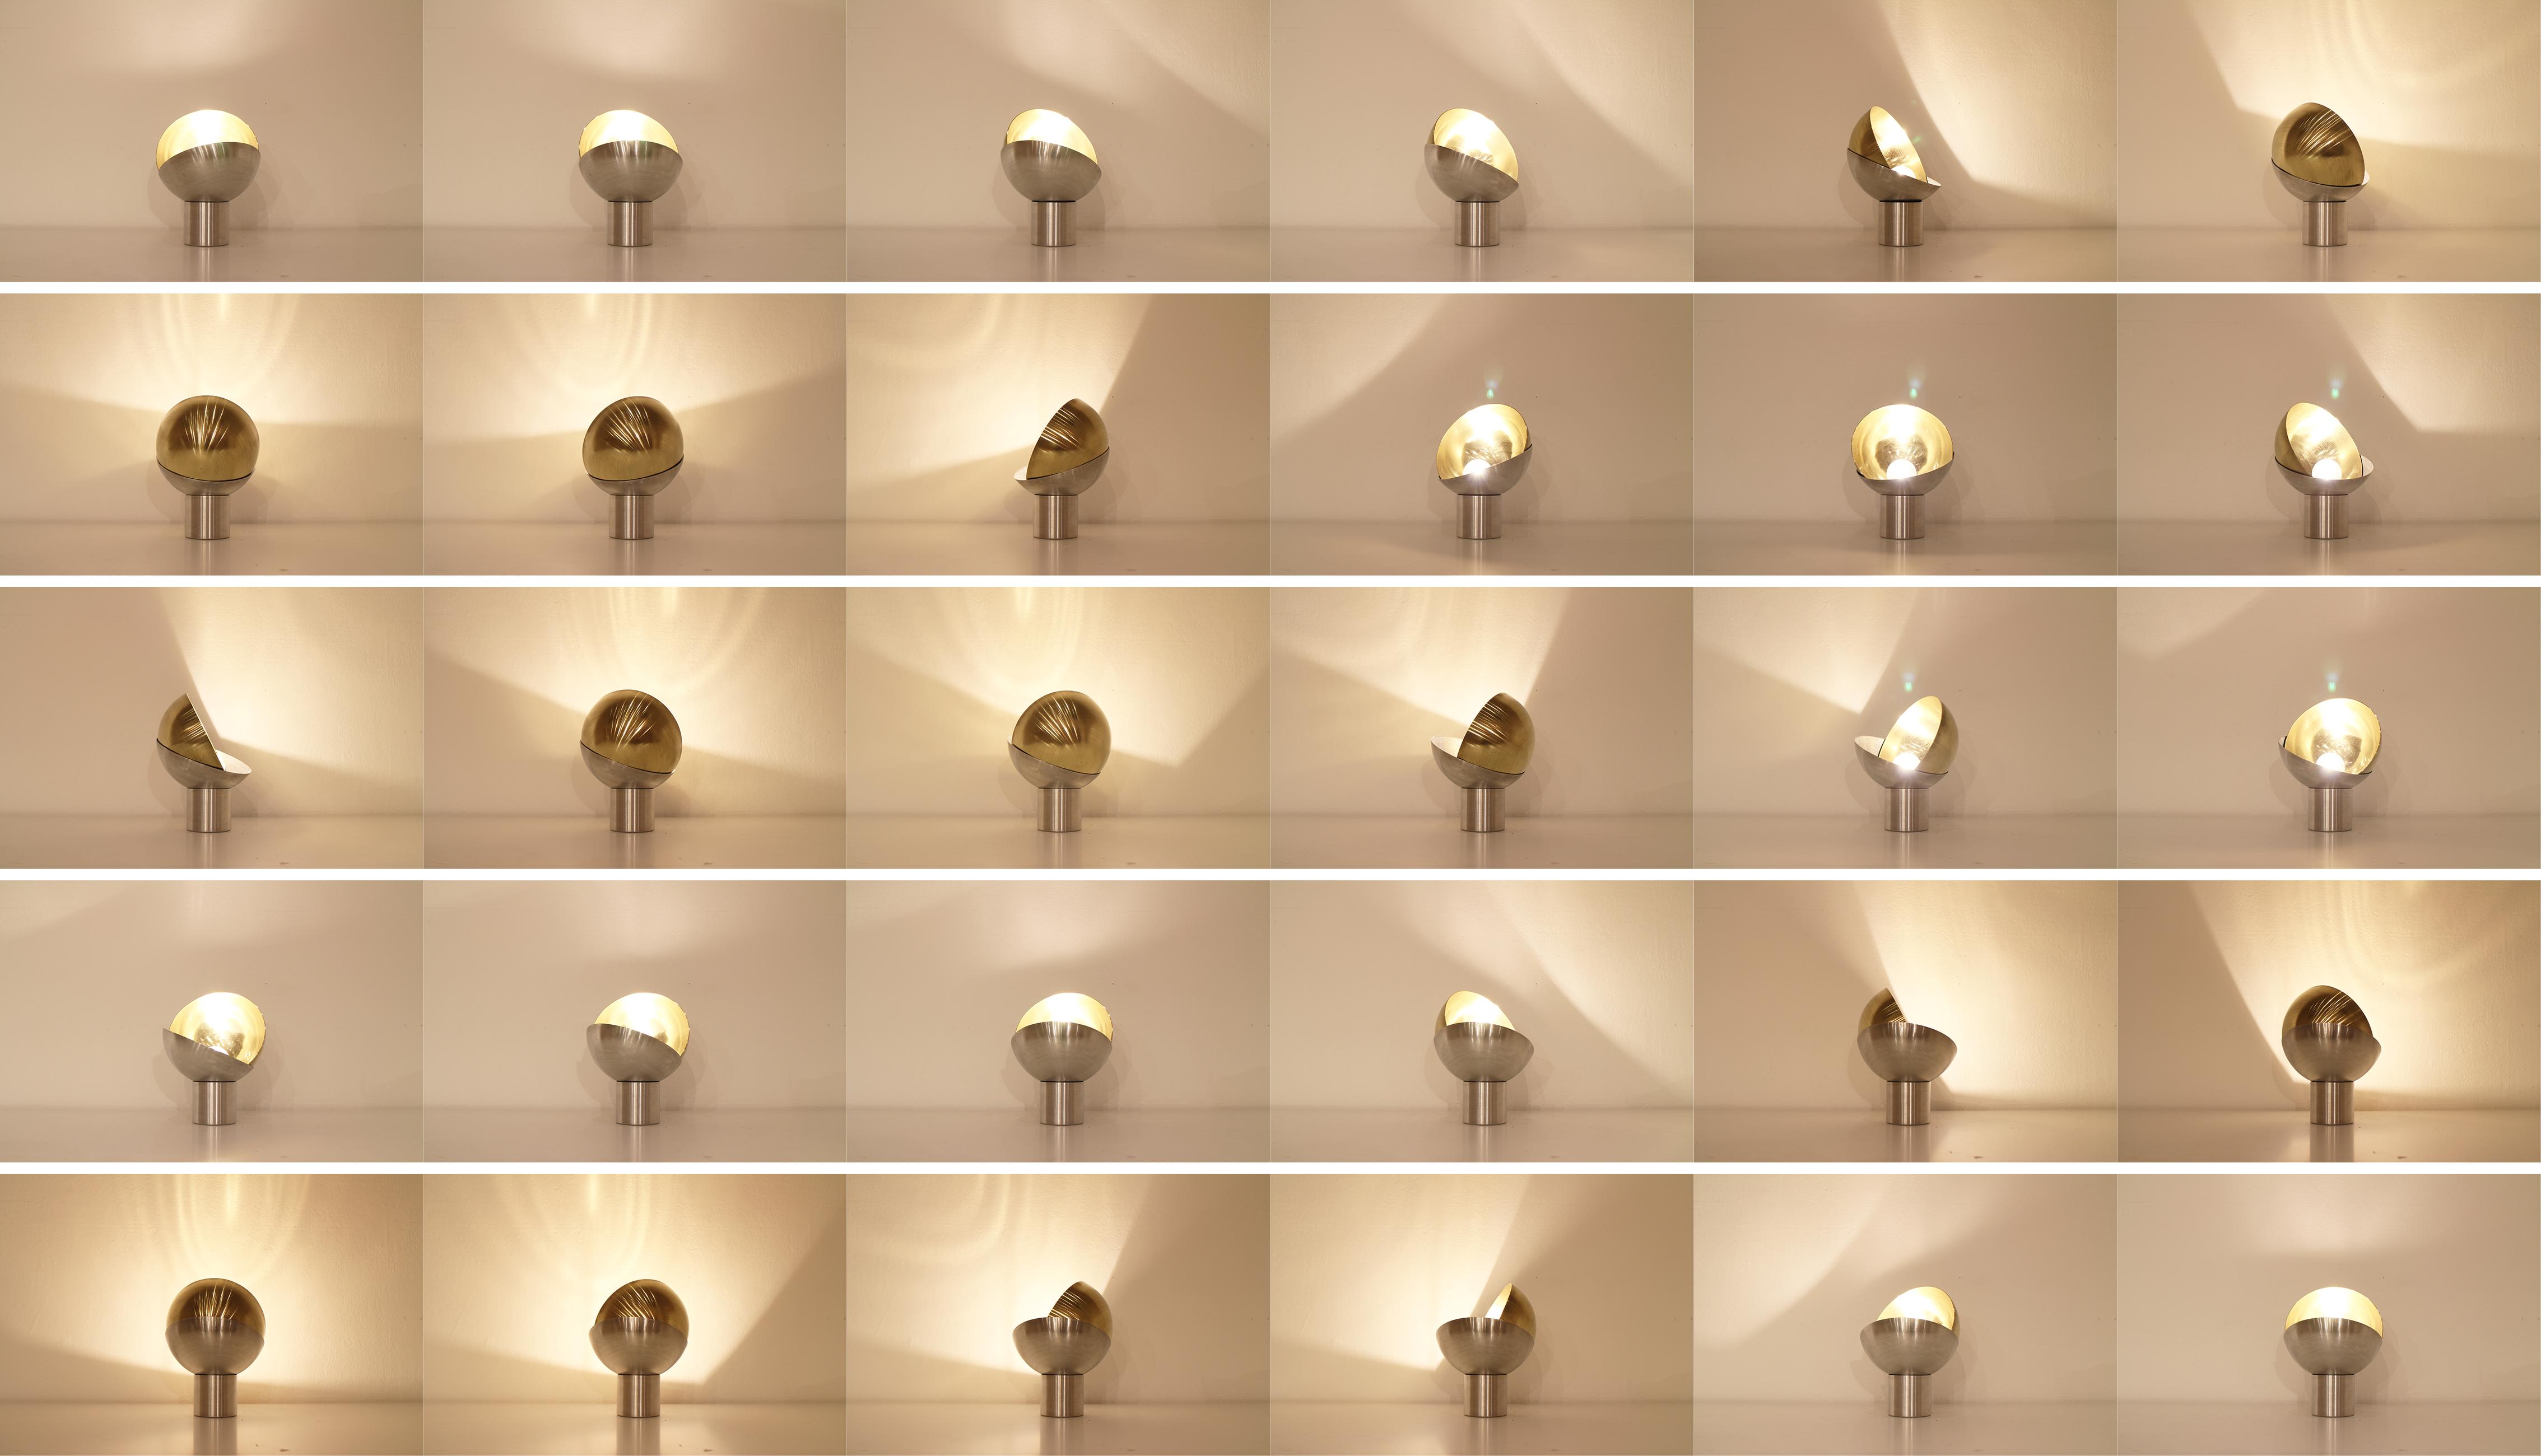 spinn_01.jpg